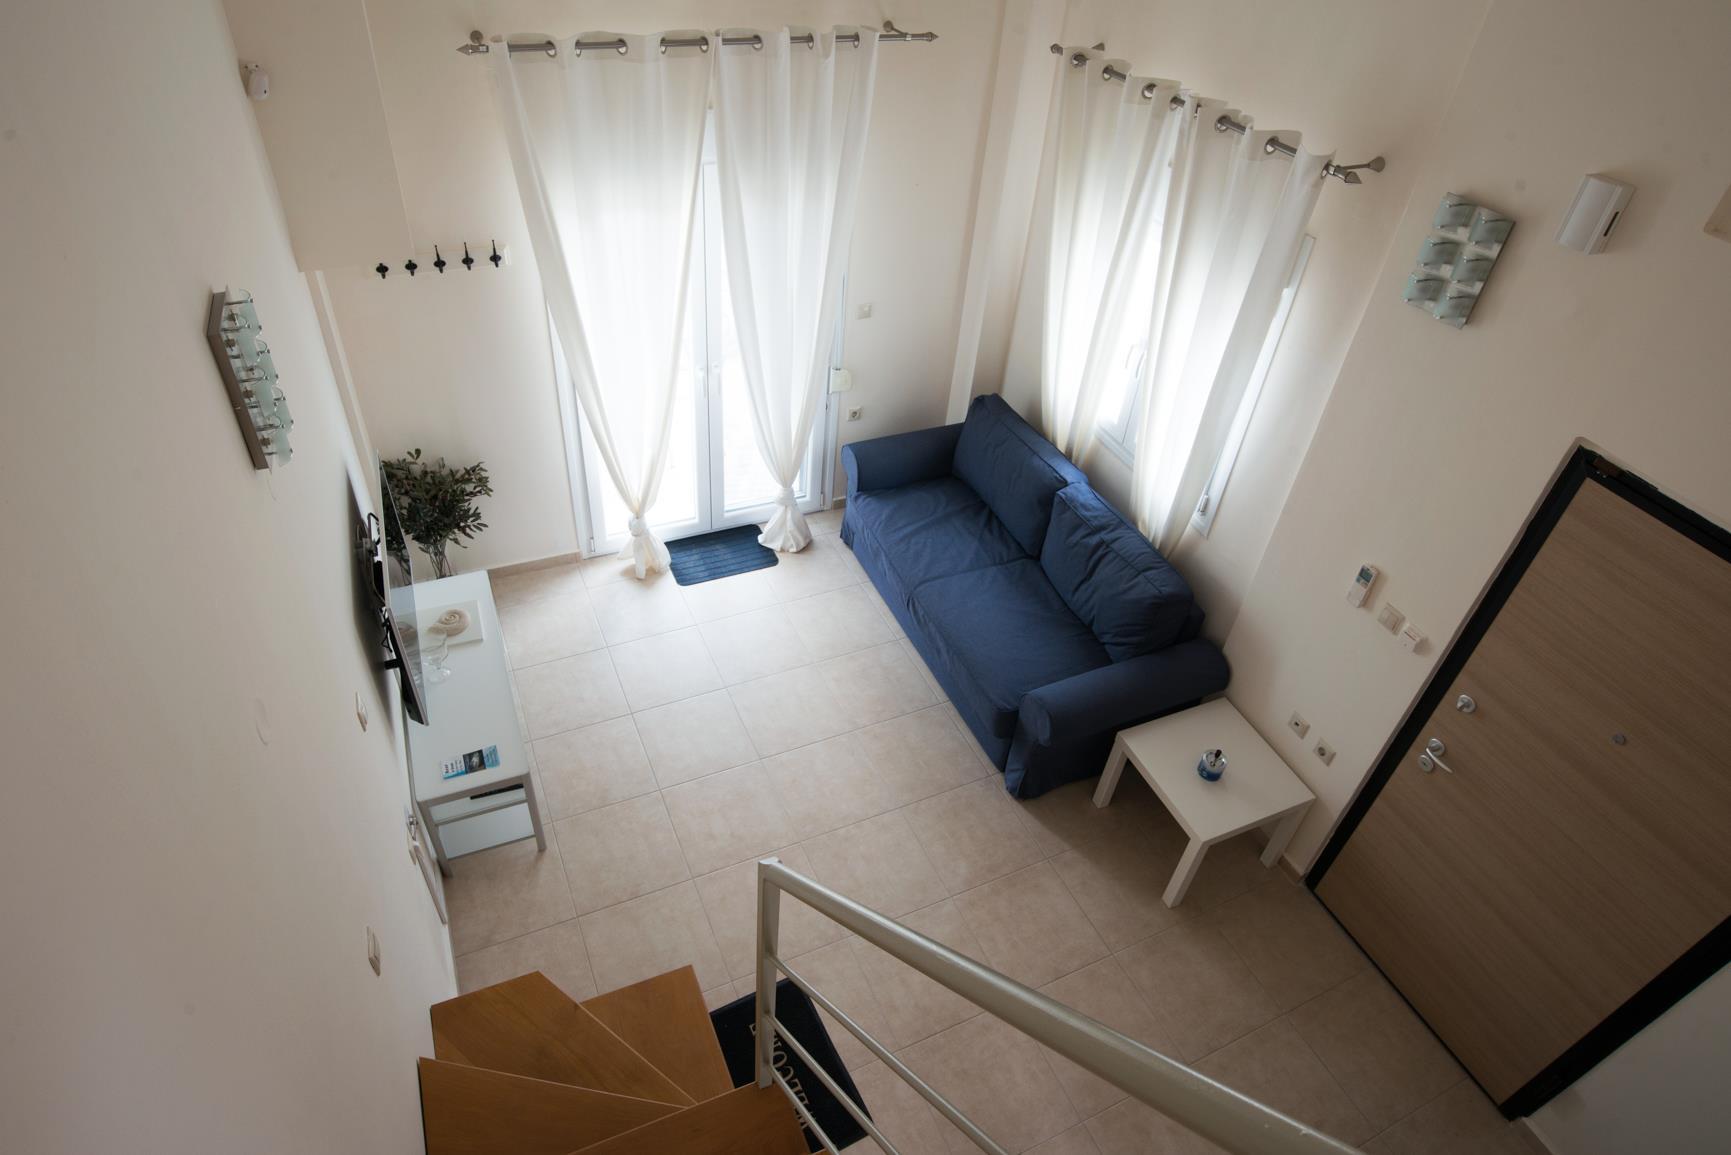 Rodanthi_06 Bitzios Apartments and Studios - Bitzios Appartments and Studios